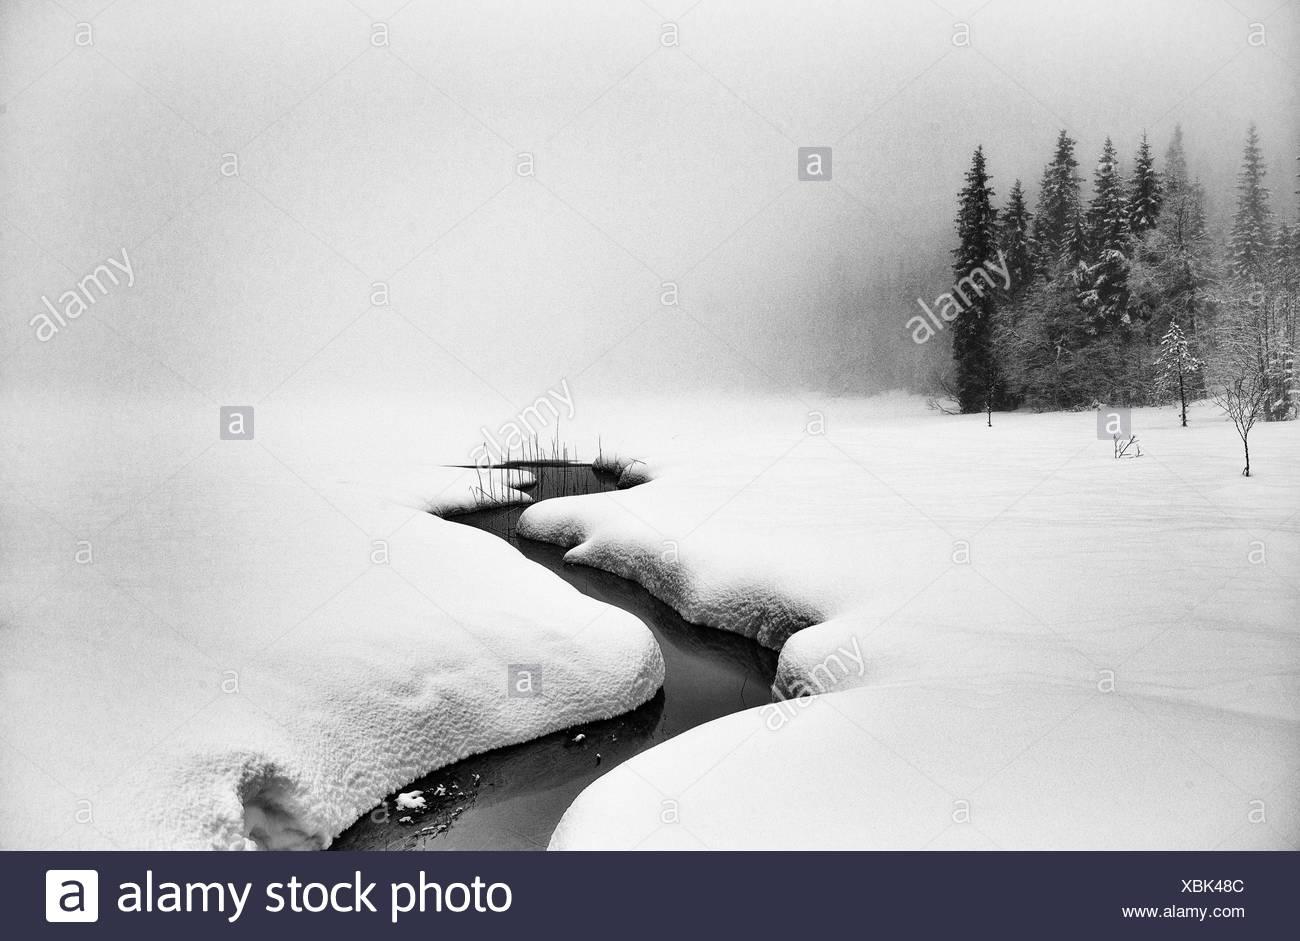 Norway, Winter landscape - Stock Image